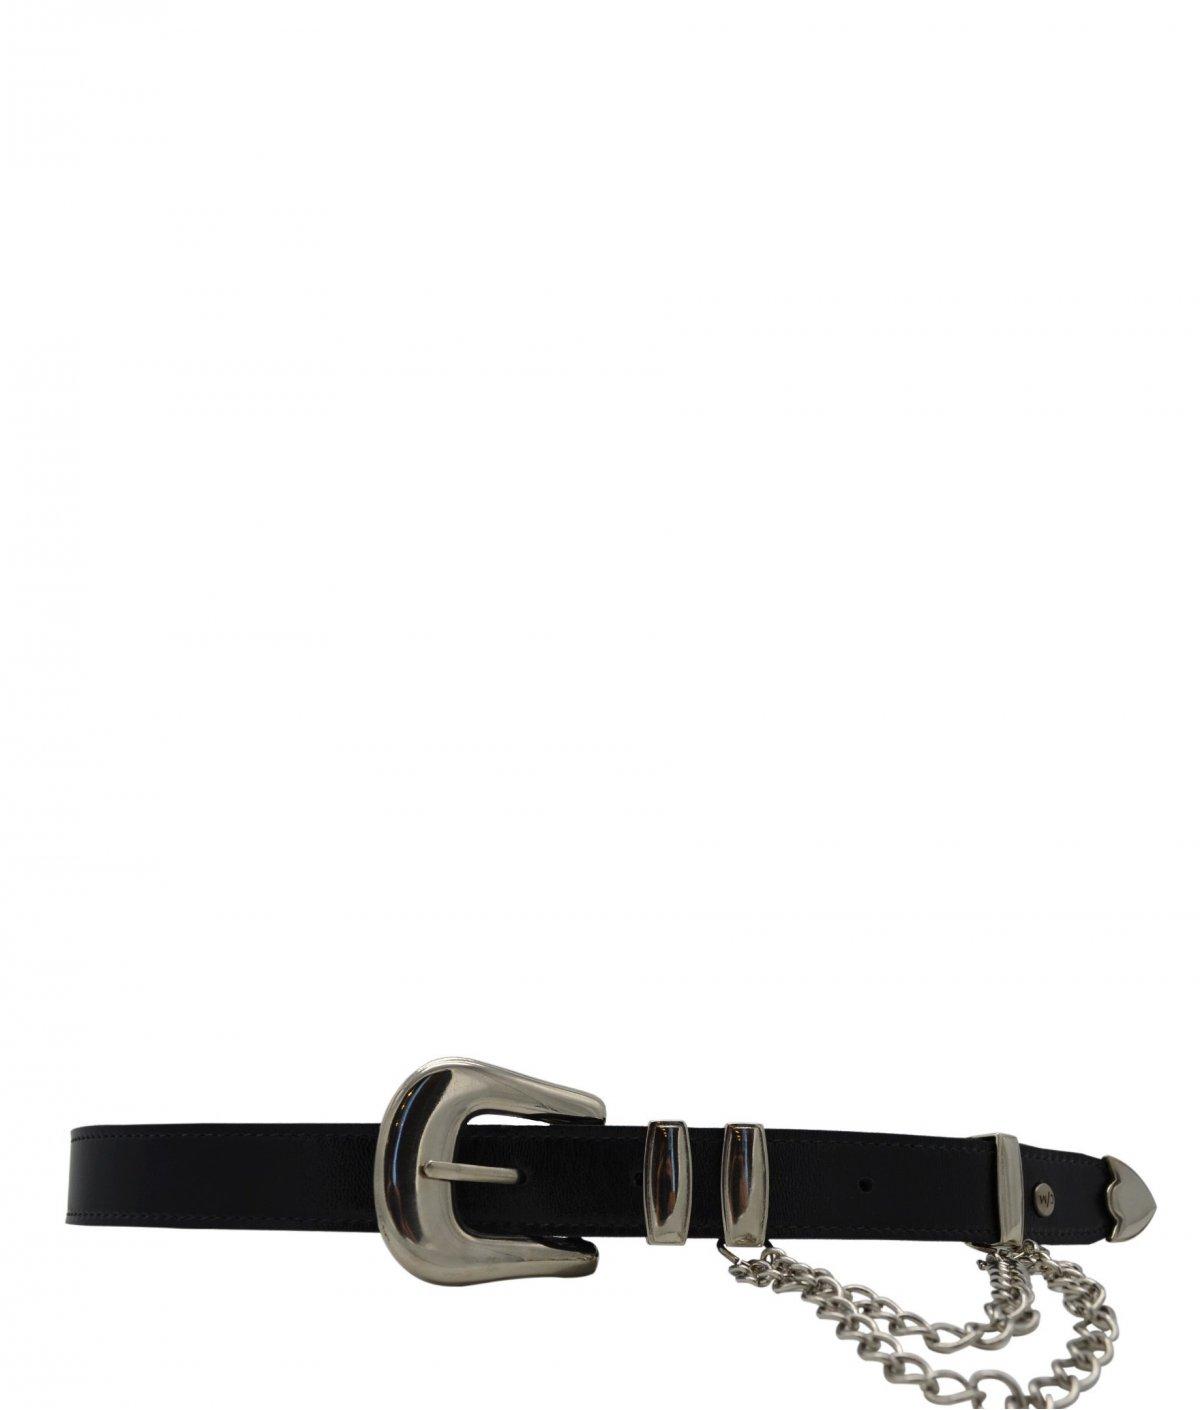 Cinturones Cinturon 814 Richato